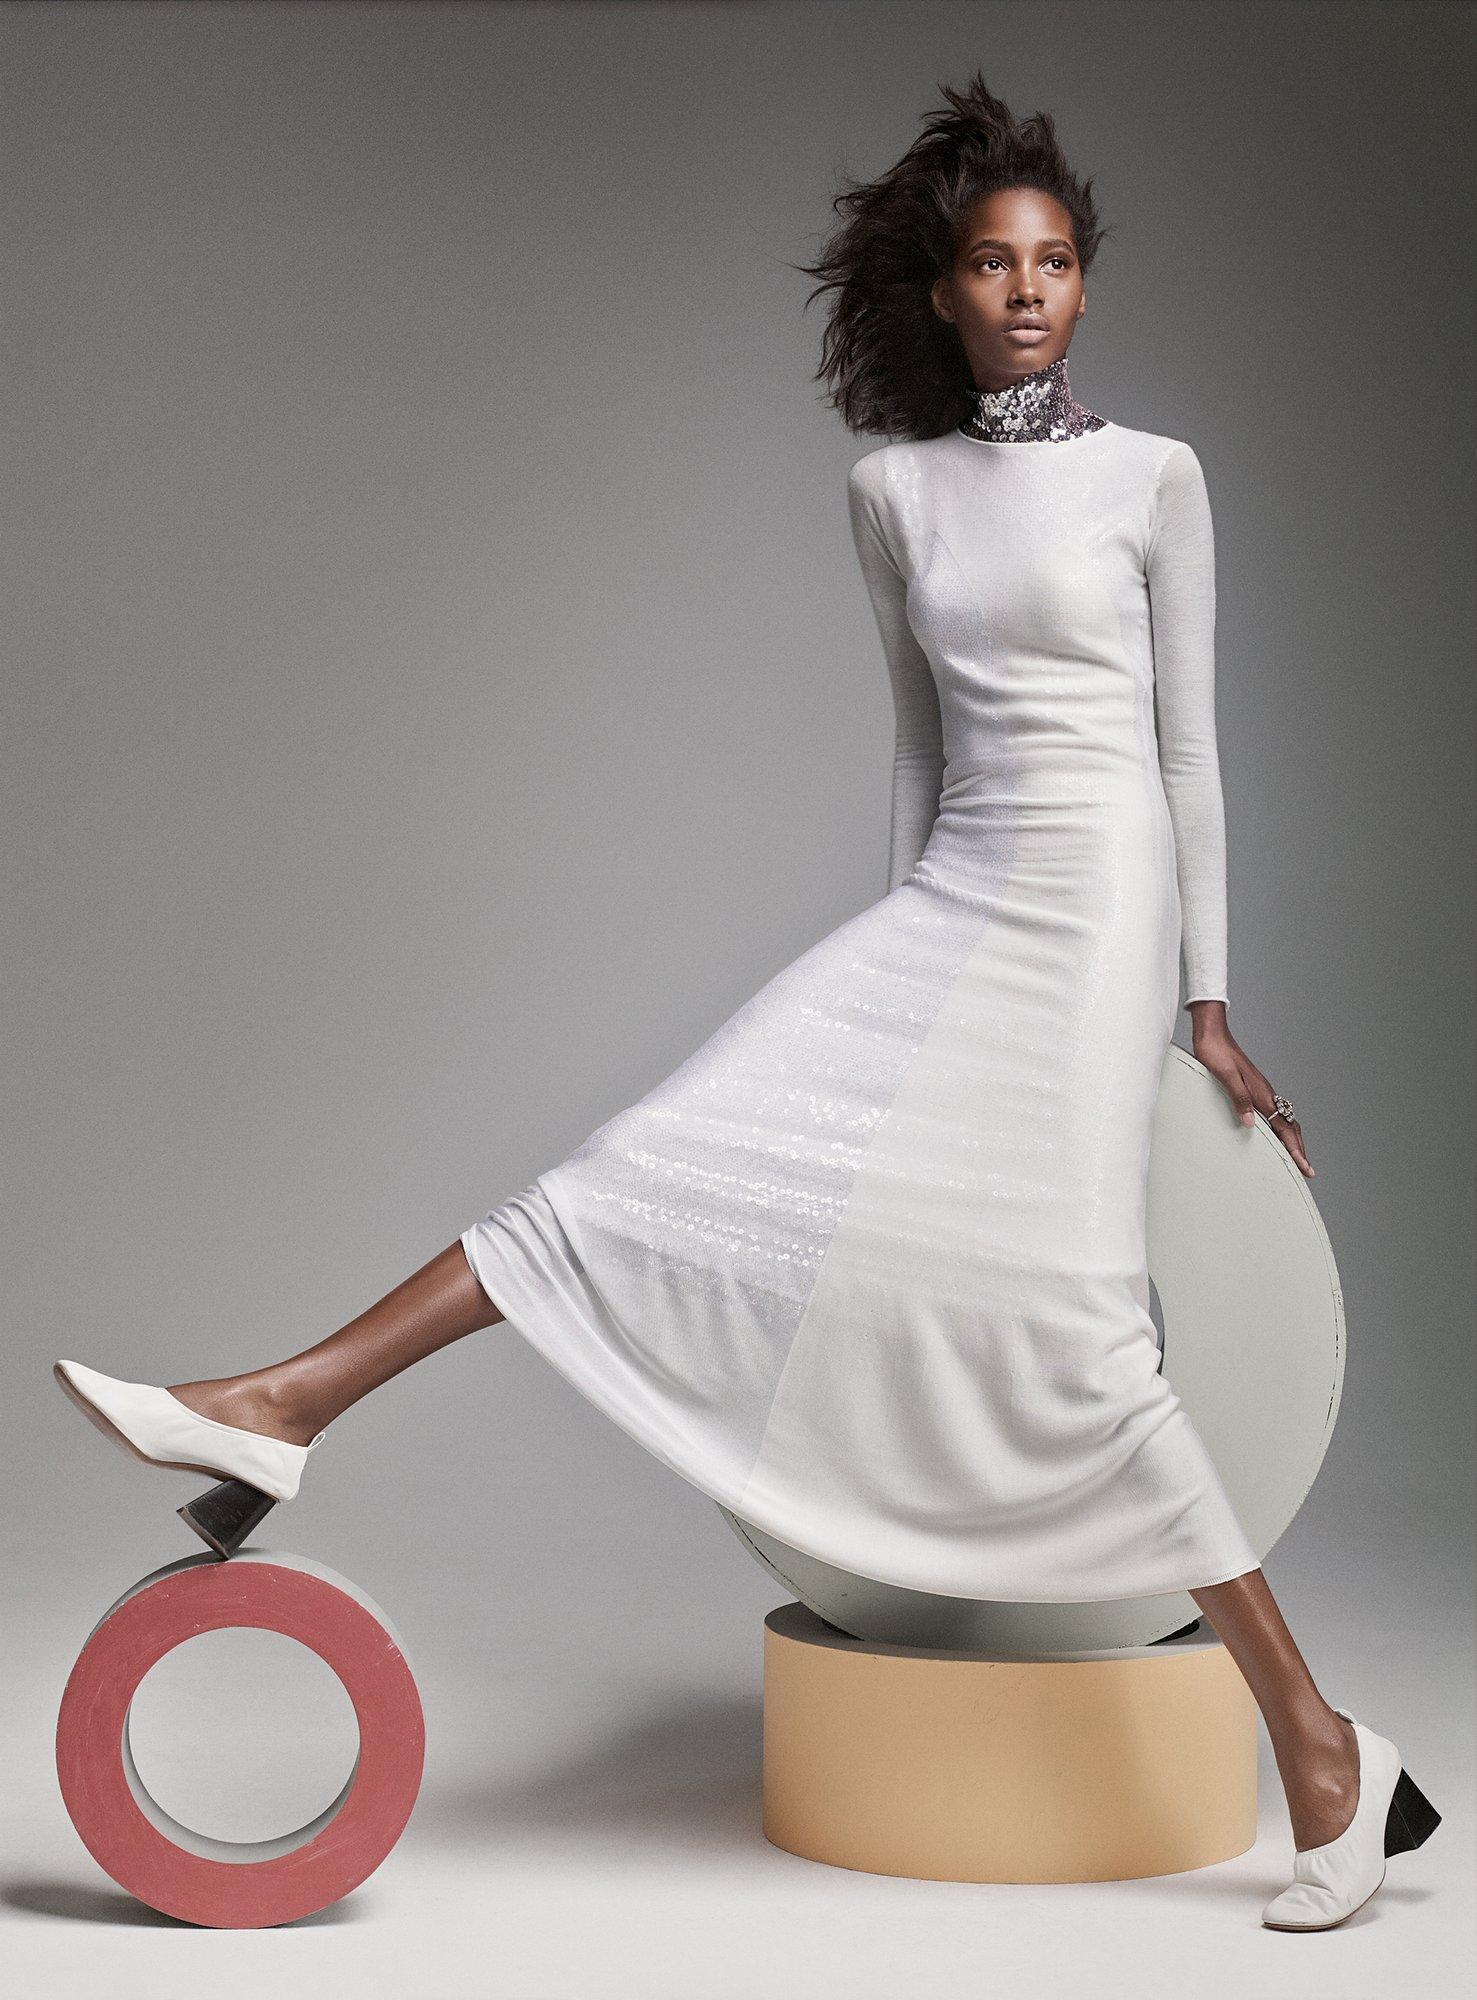 Tami Williams in a Christian Dior dress